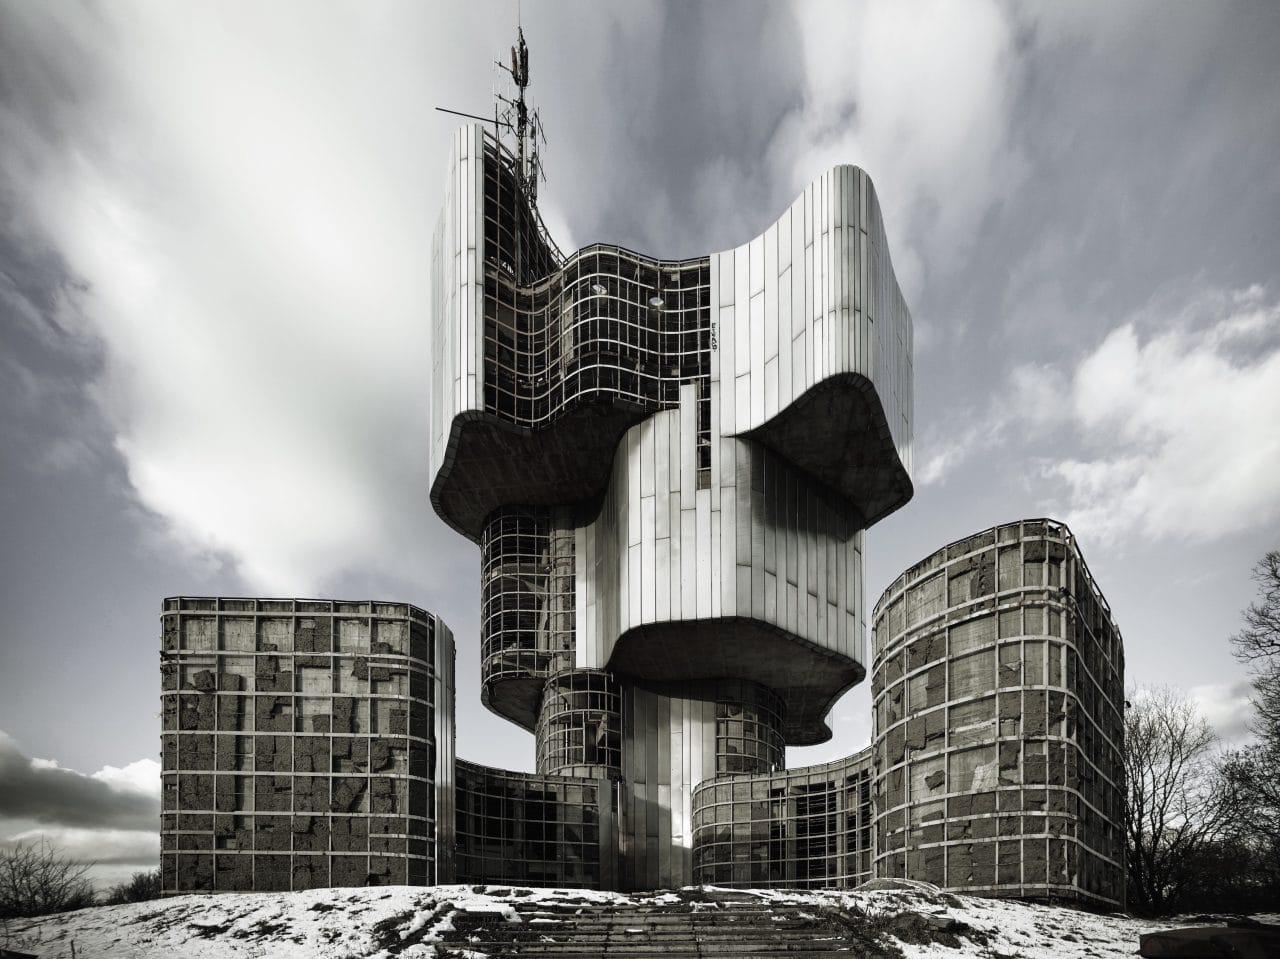 monument-uprising-people-kordun-banija-1280x959.jpg